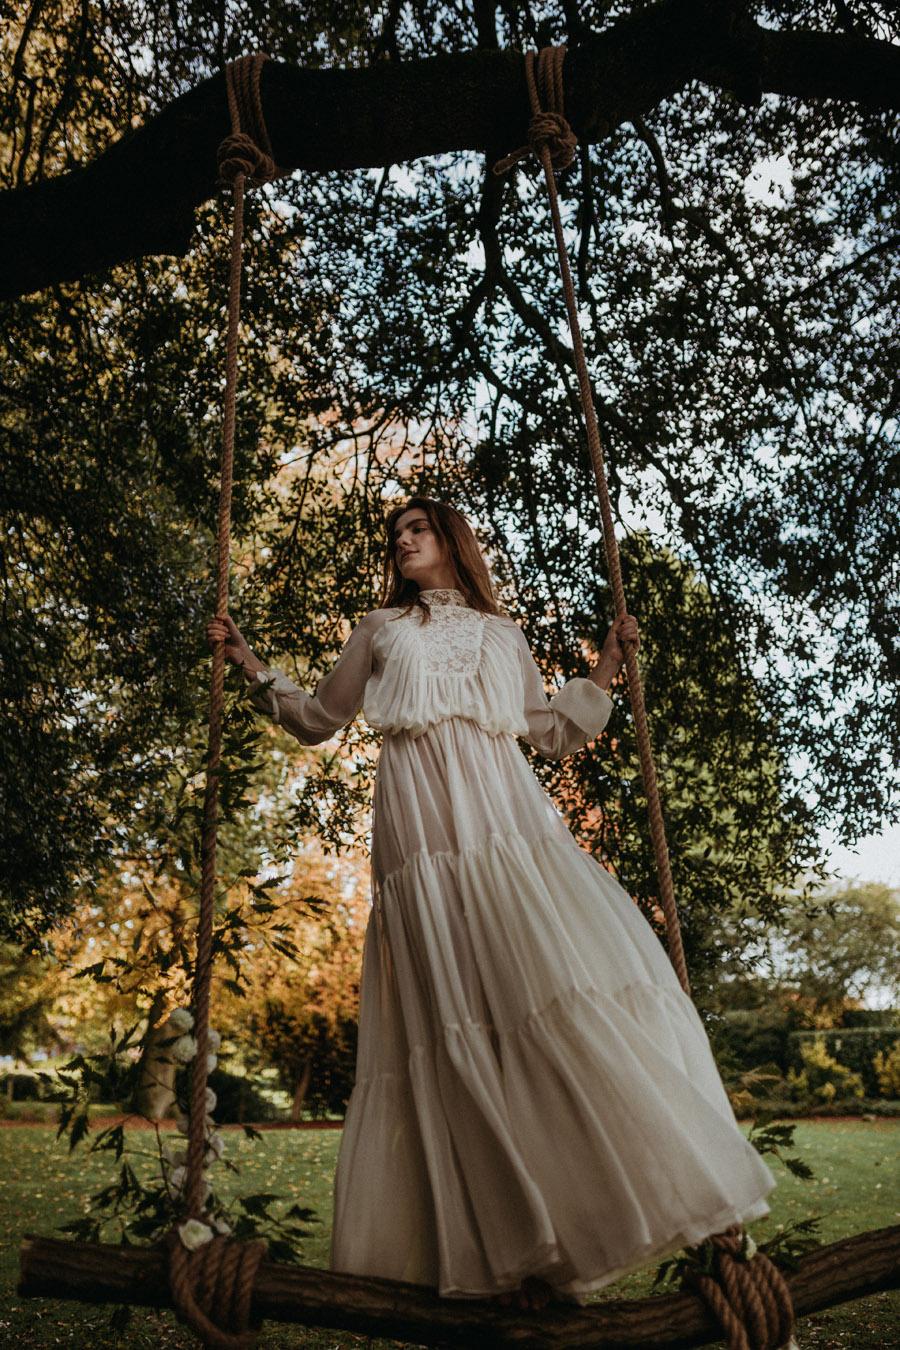 Sanyukta Shrestha autumn daydream bridal collection 2020 (18)